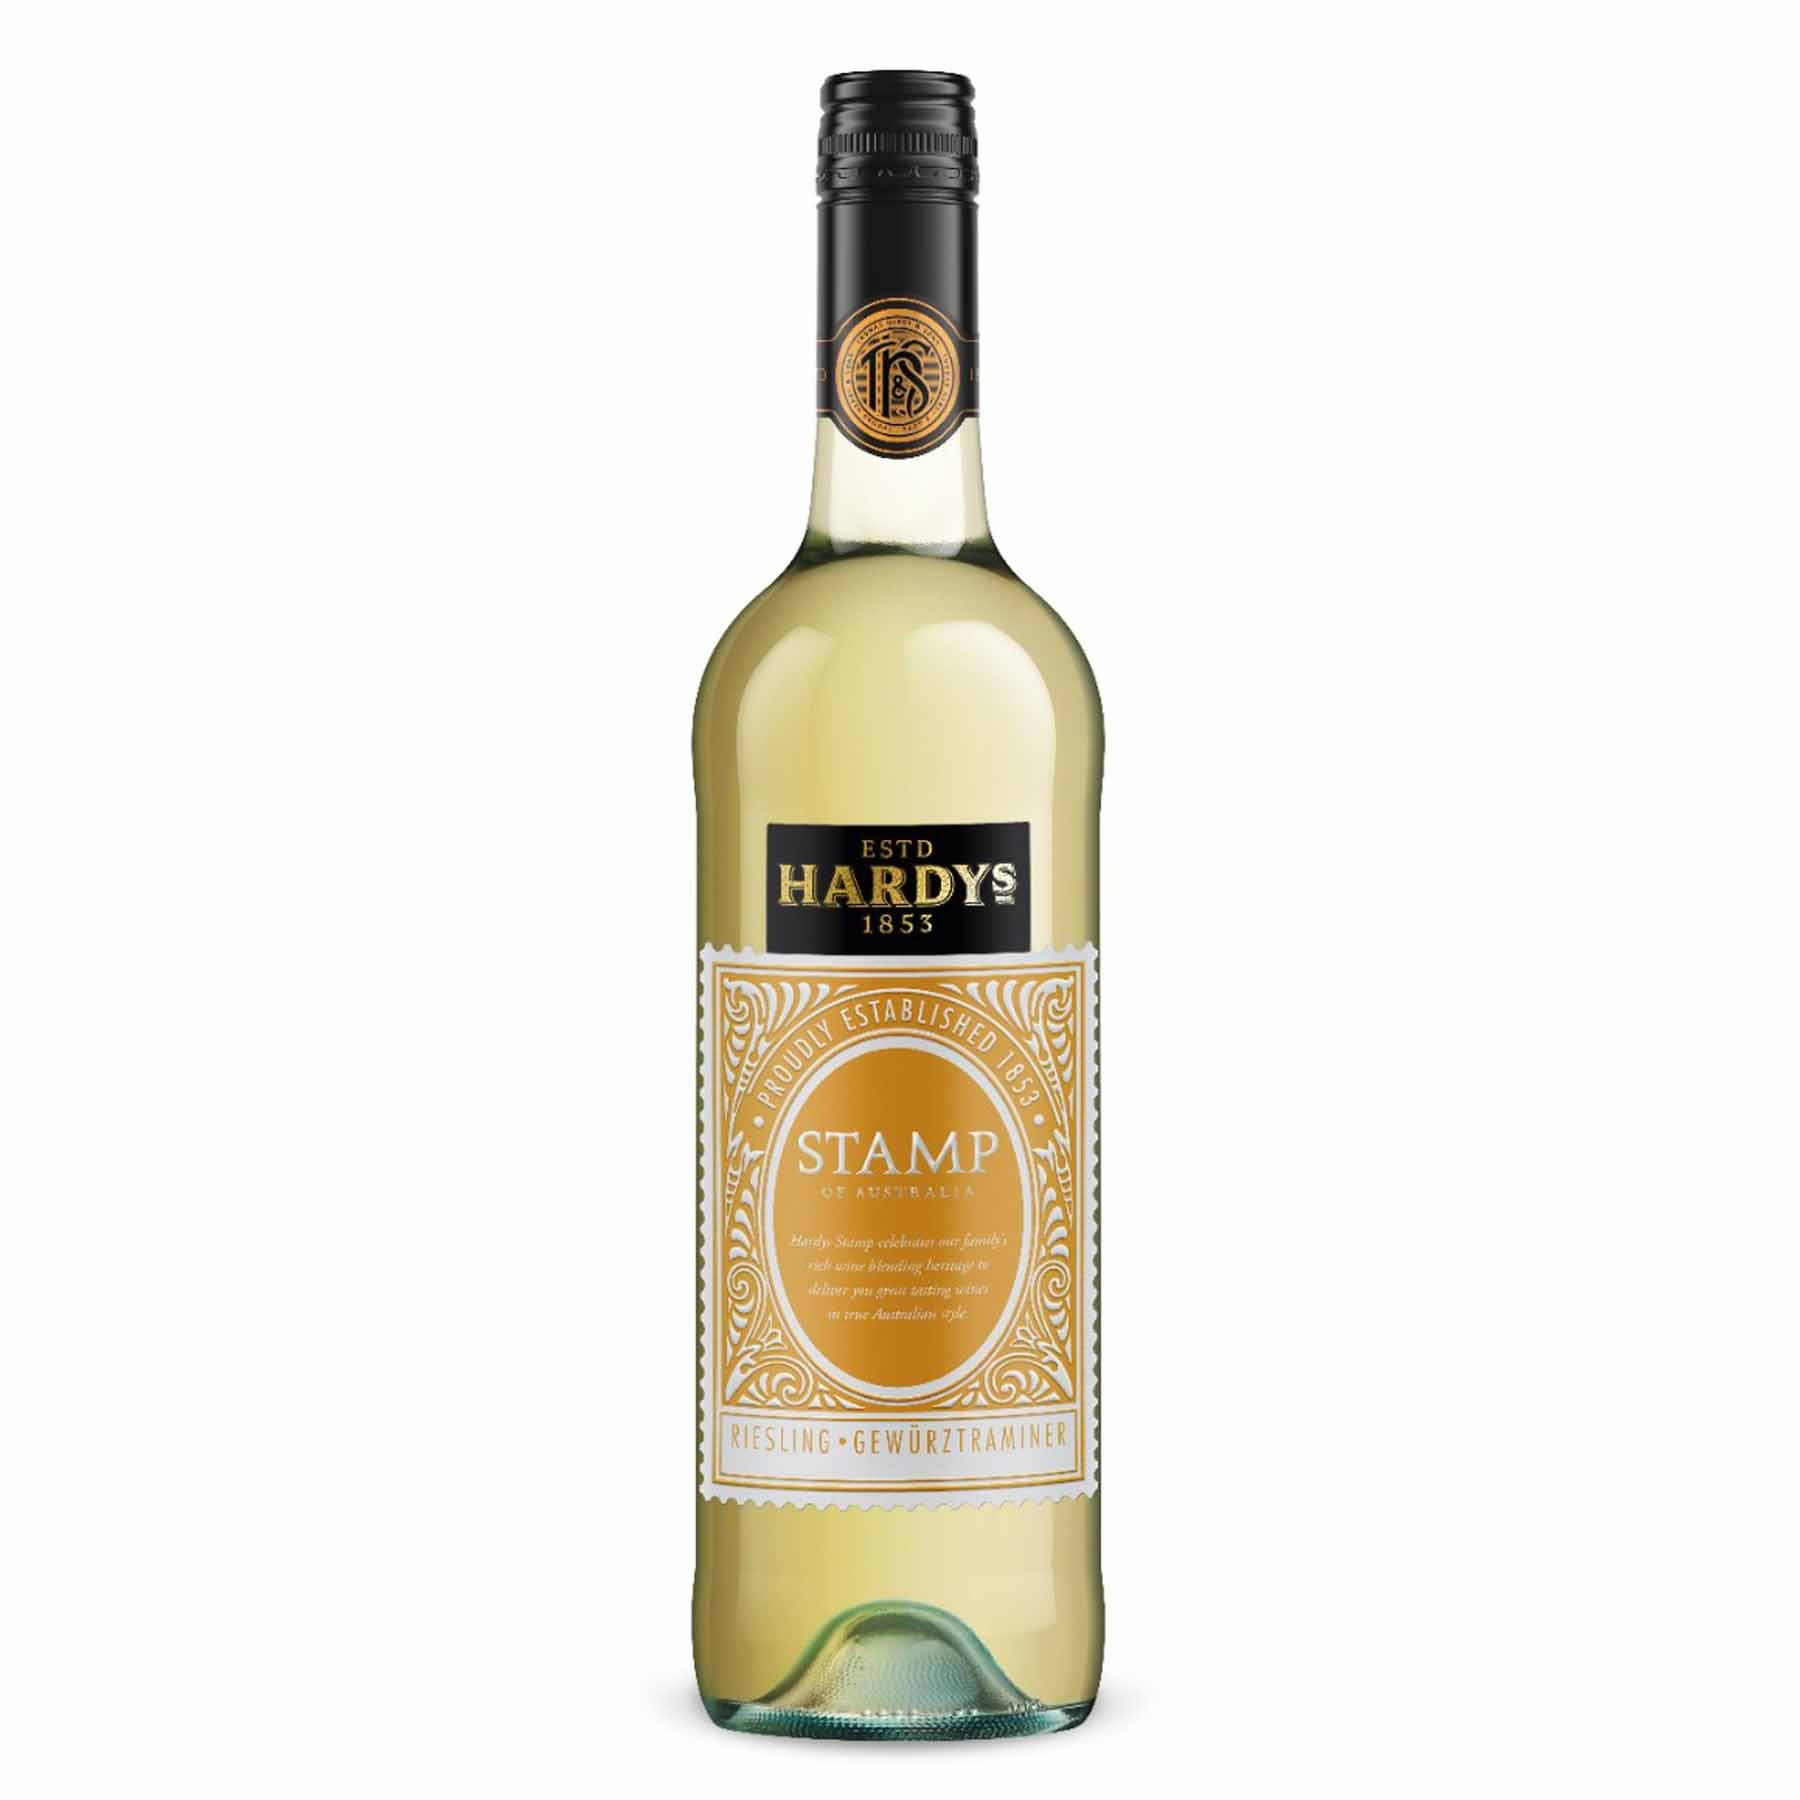 Vinho Branco Australiano Hardy's Stamp Riesling-Gewurztraminer 2014